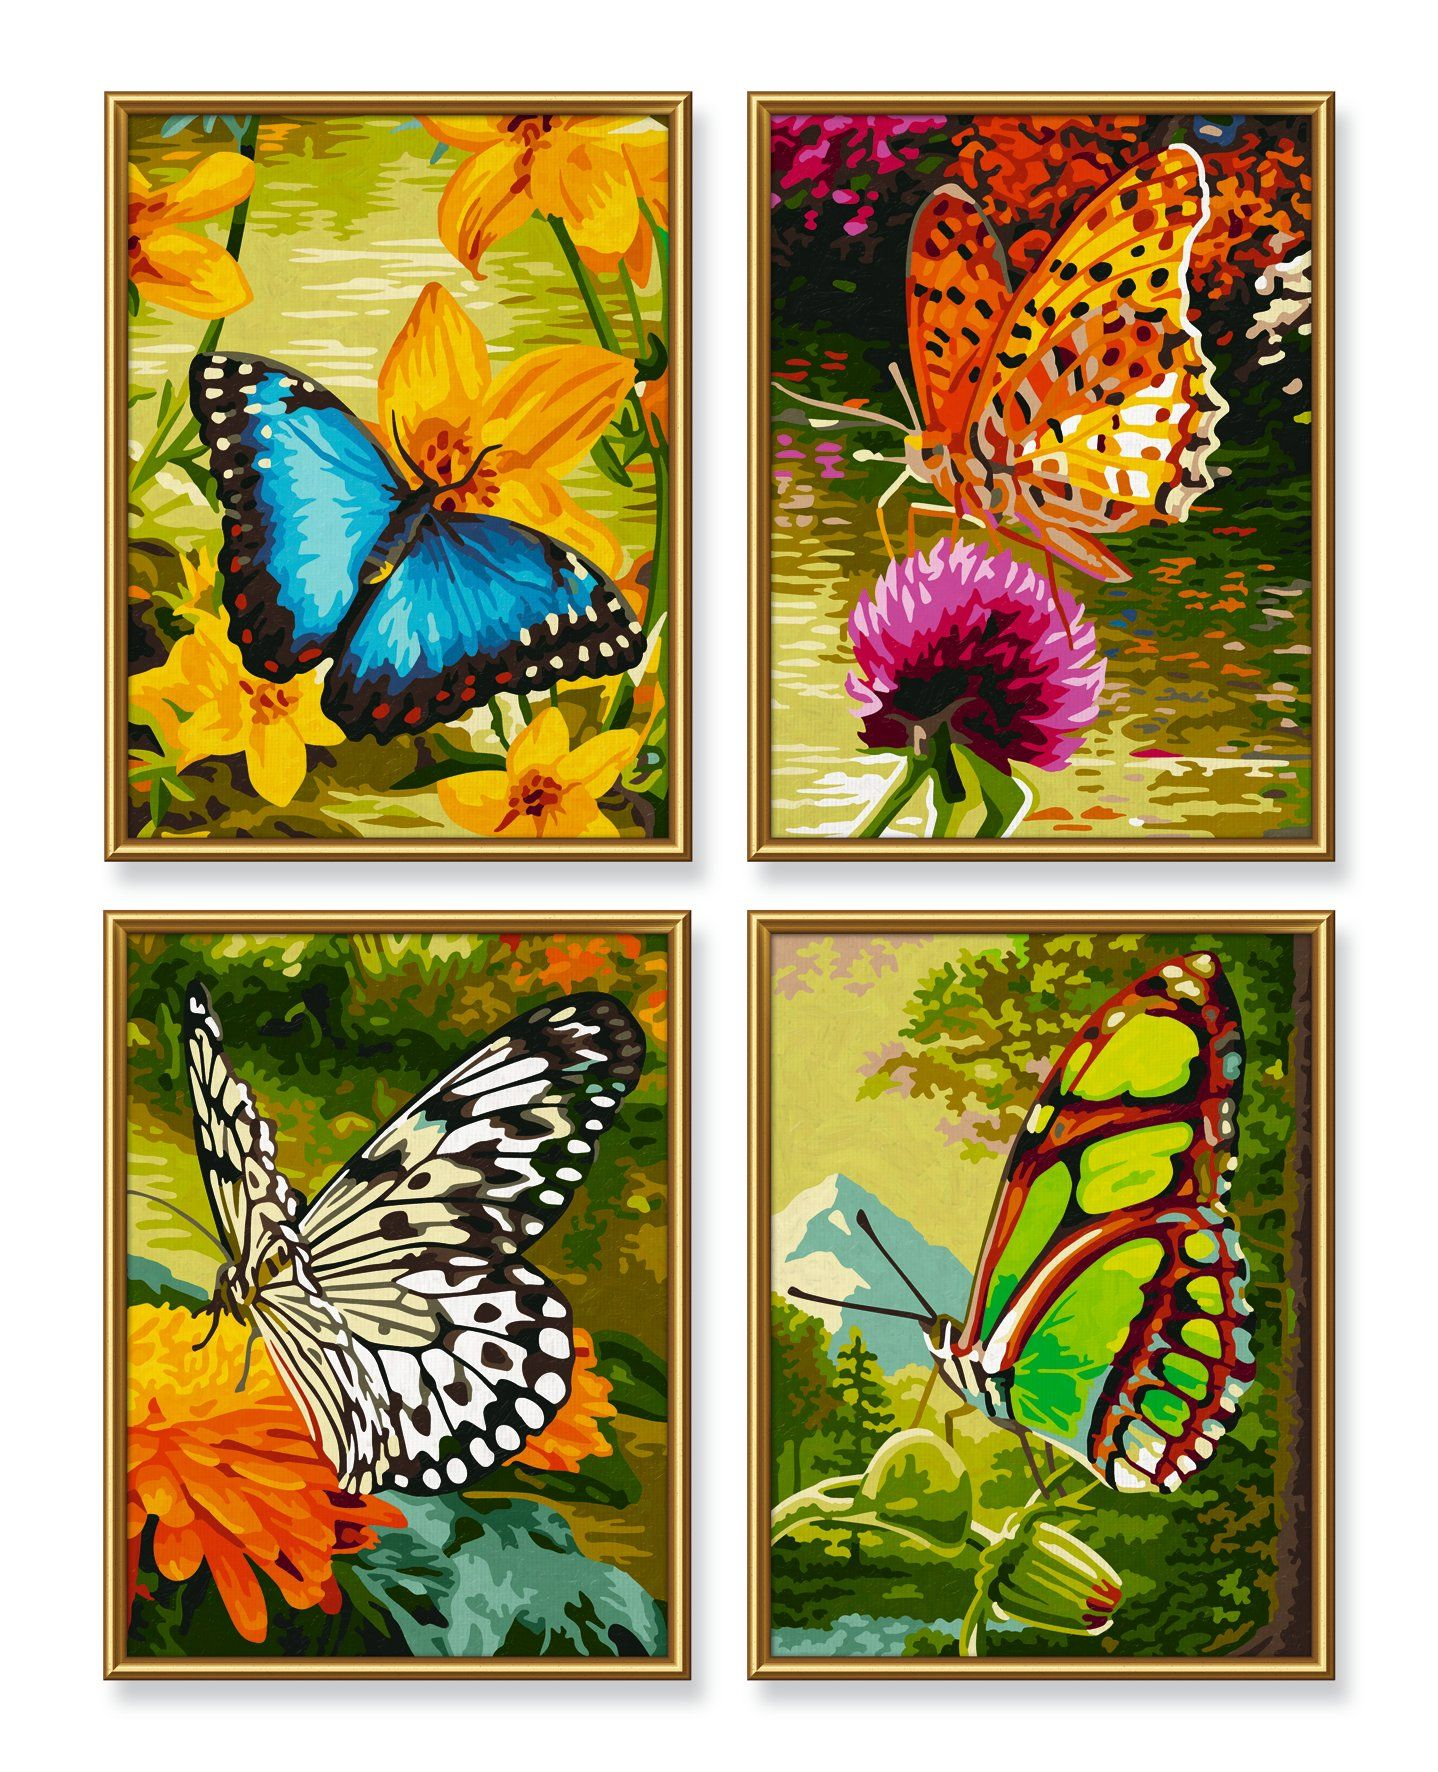 Schipper 609340628 Malen Nach Zahlen Schmetterlinge Quattro Je 18x24 Cm Amazon De Spielzeug Malen Nach Zahlen Idee Farbe Schmetterling Malen